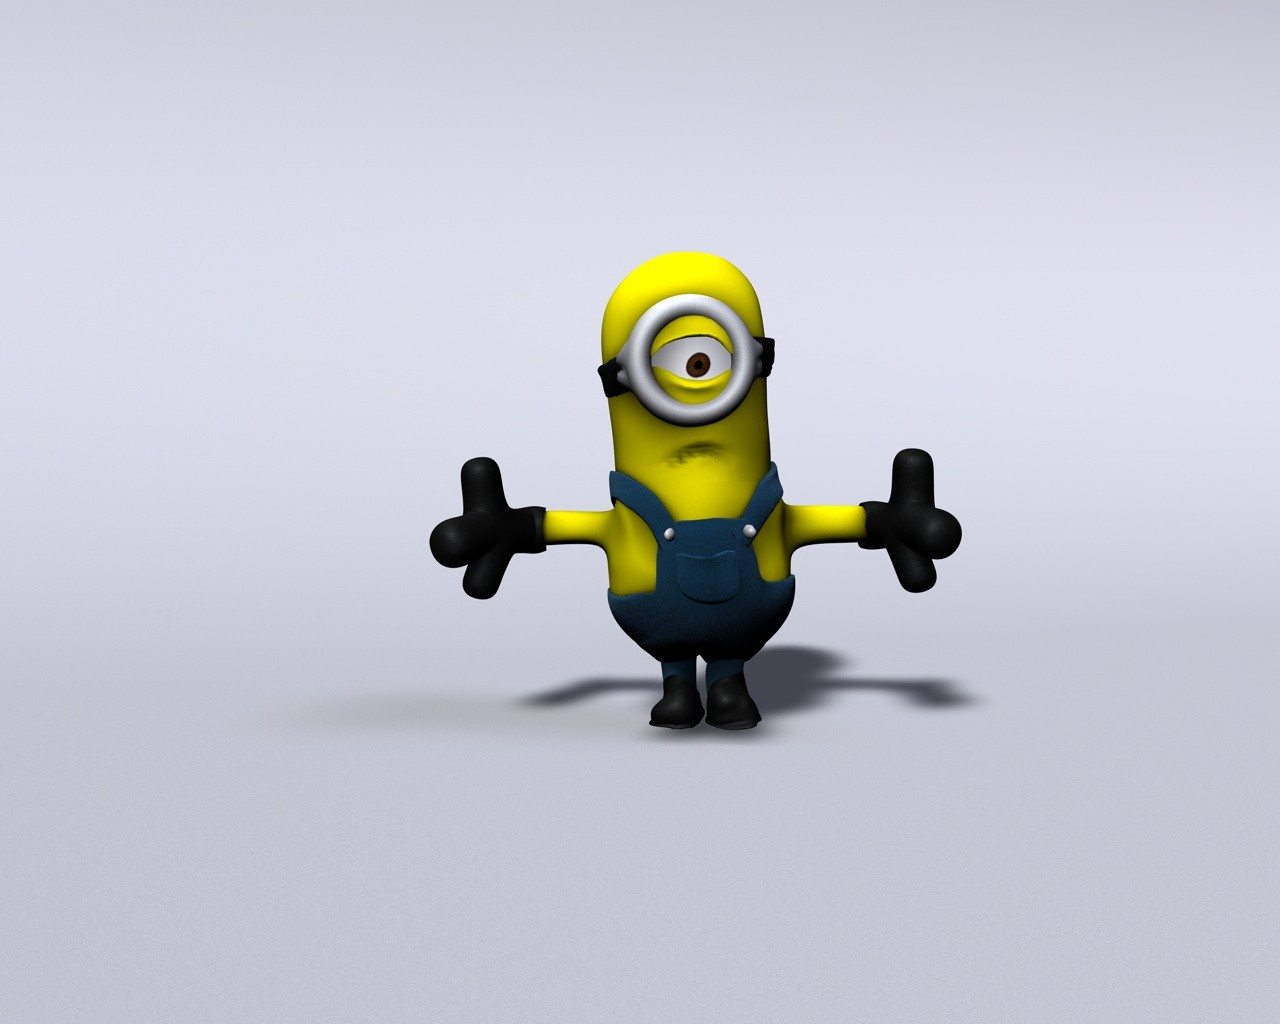 Tall Minion